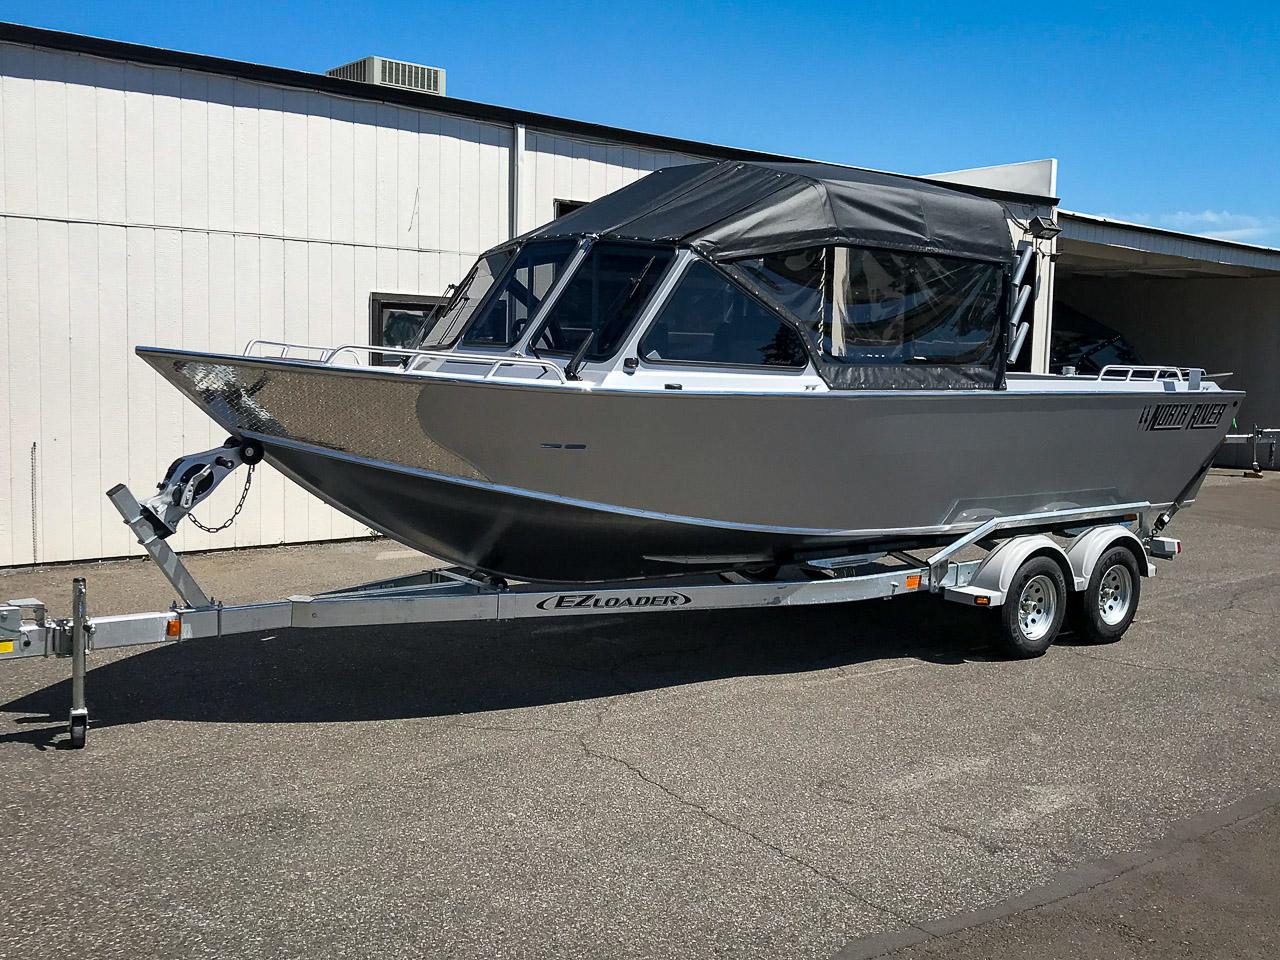 2021 NORTH RIVER 24 SeaHawk